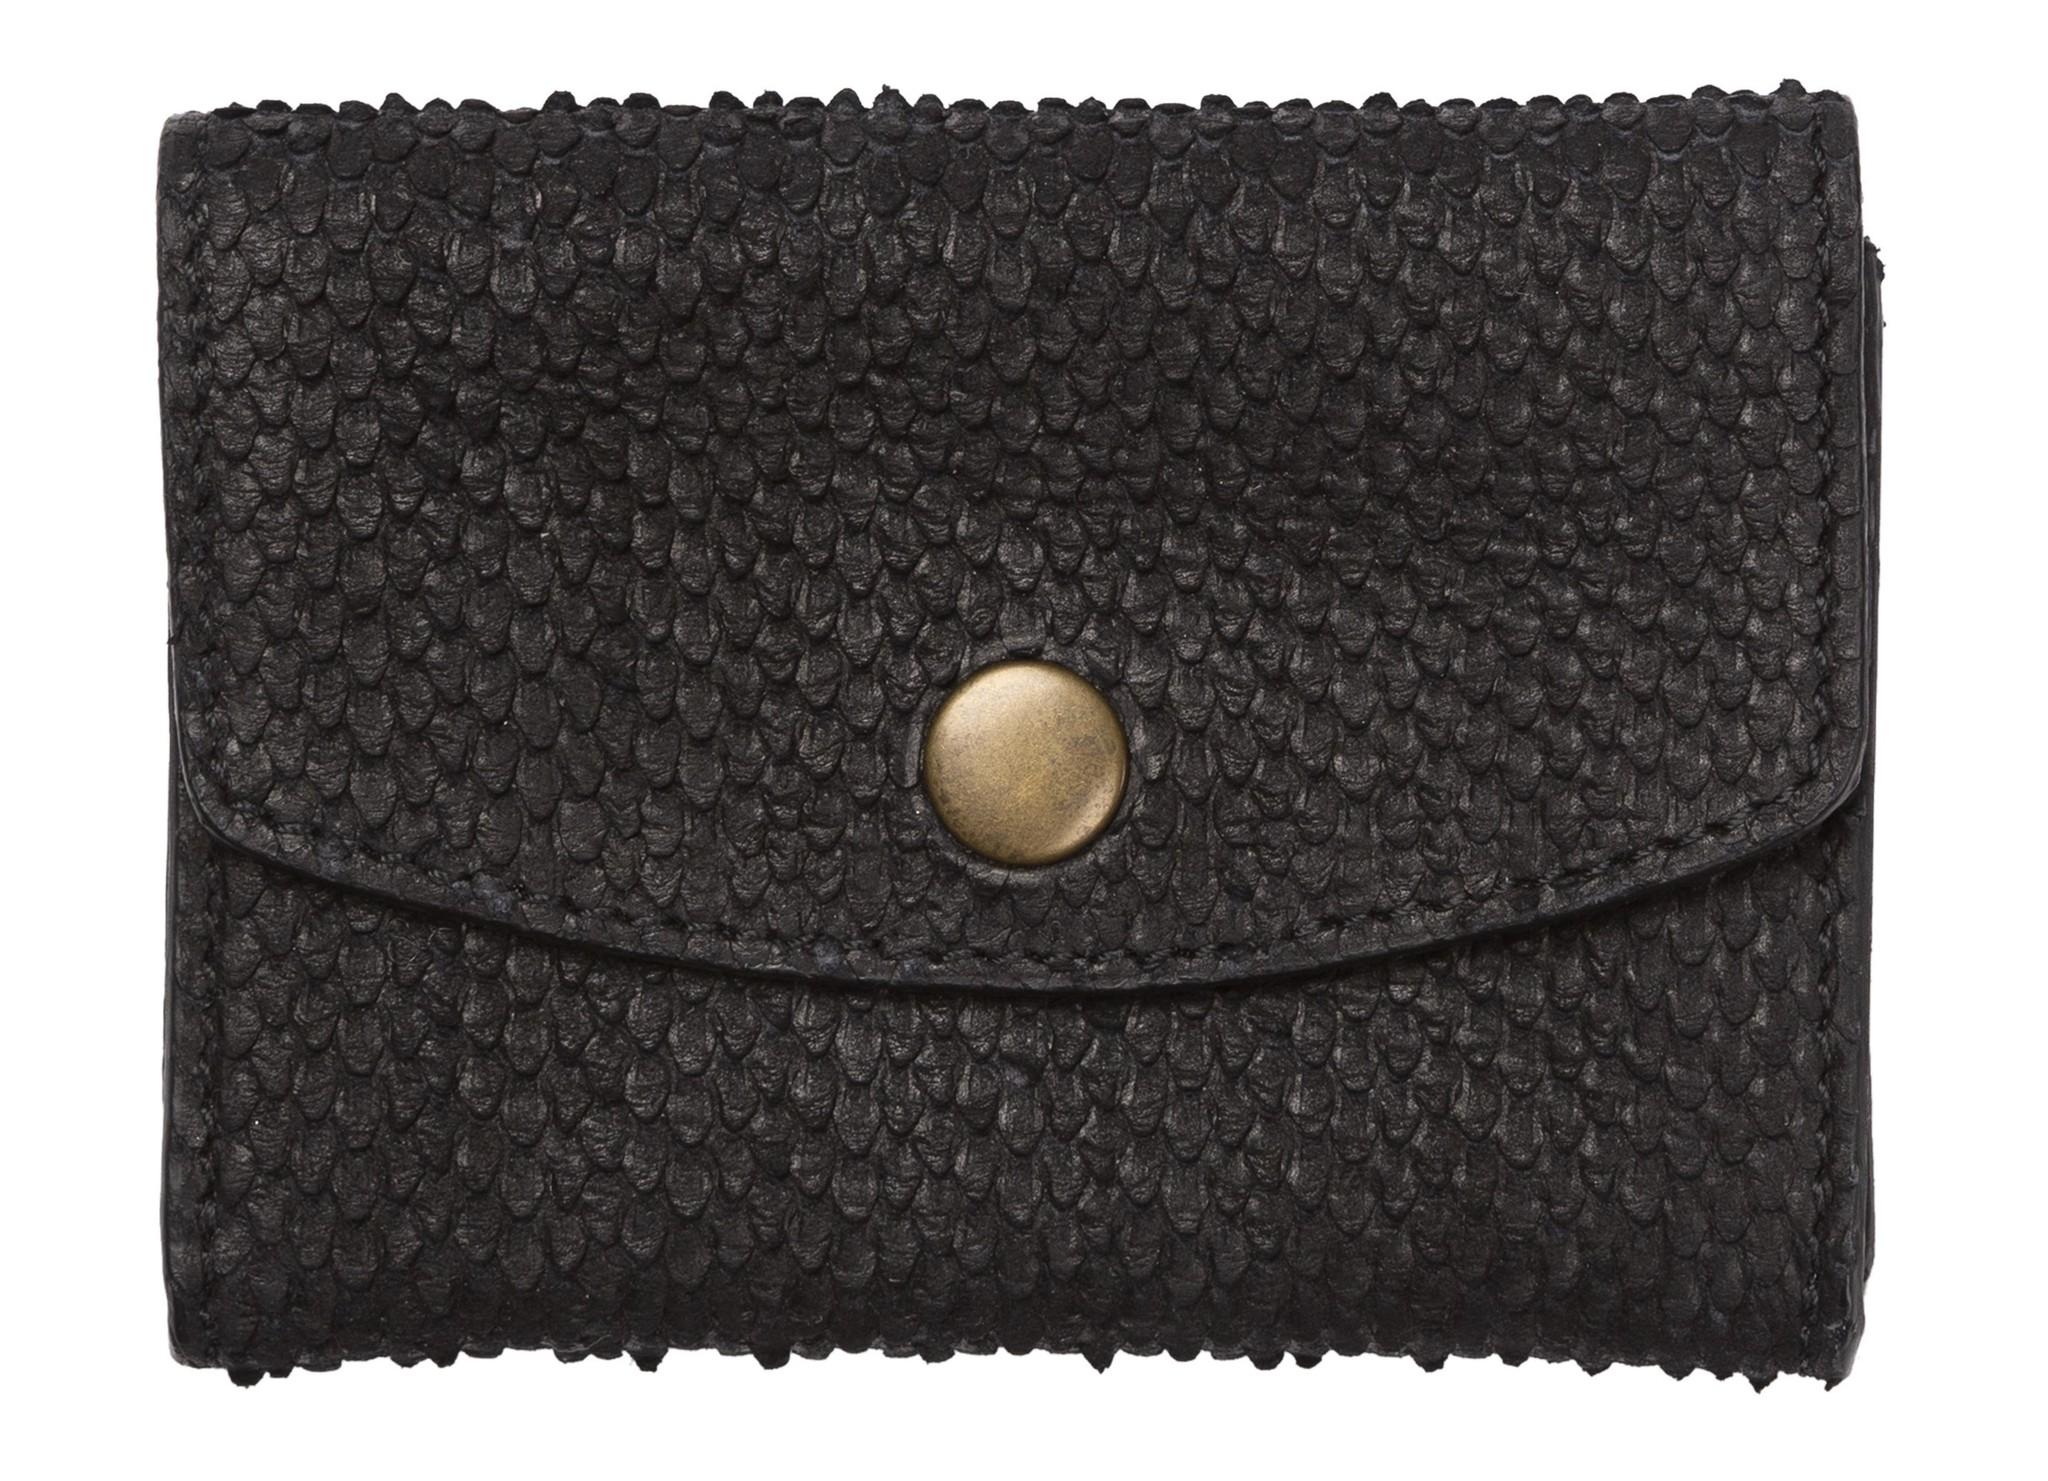 Tas Julie snake wallet black-1